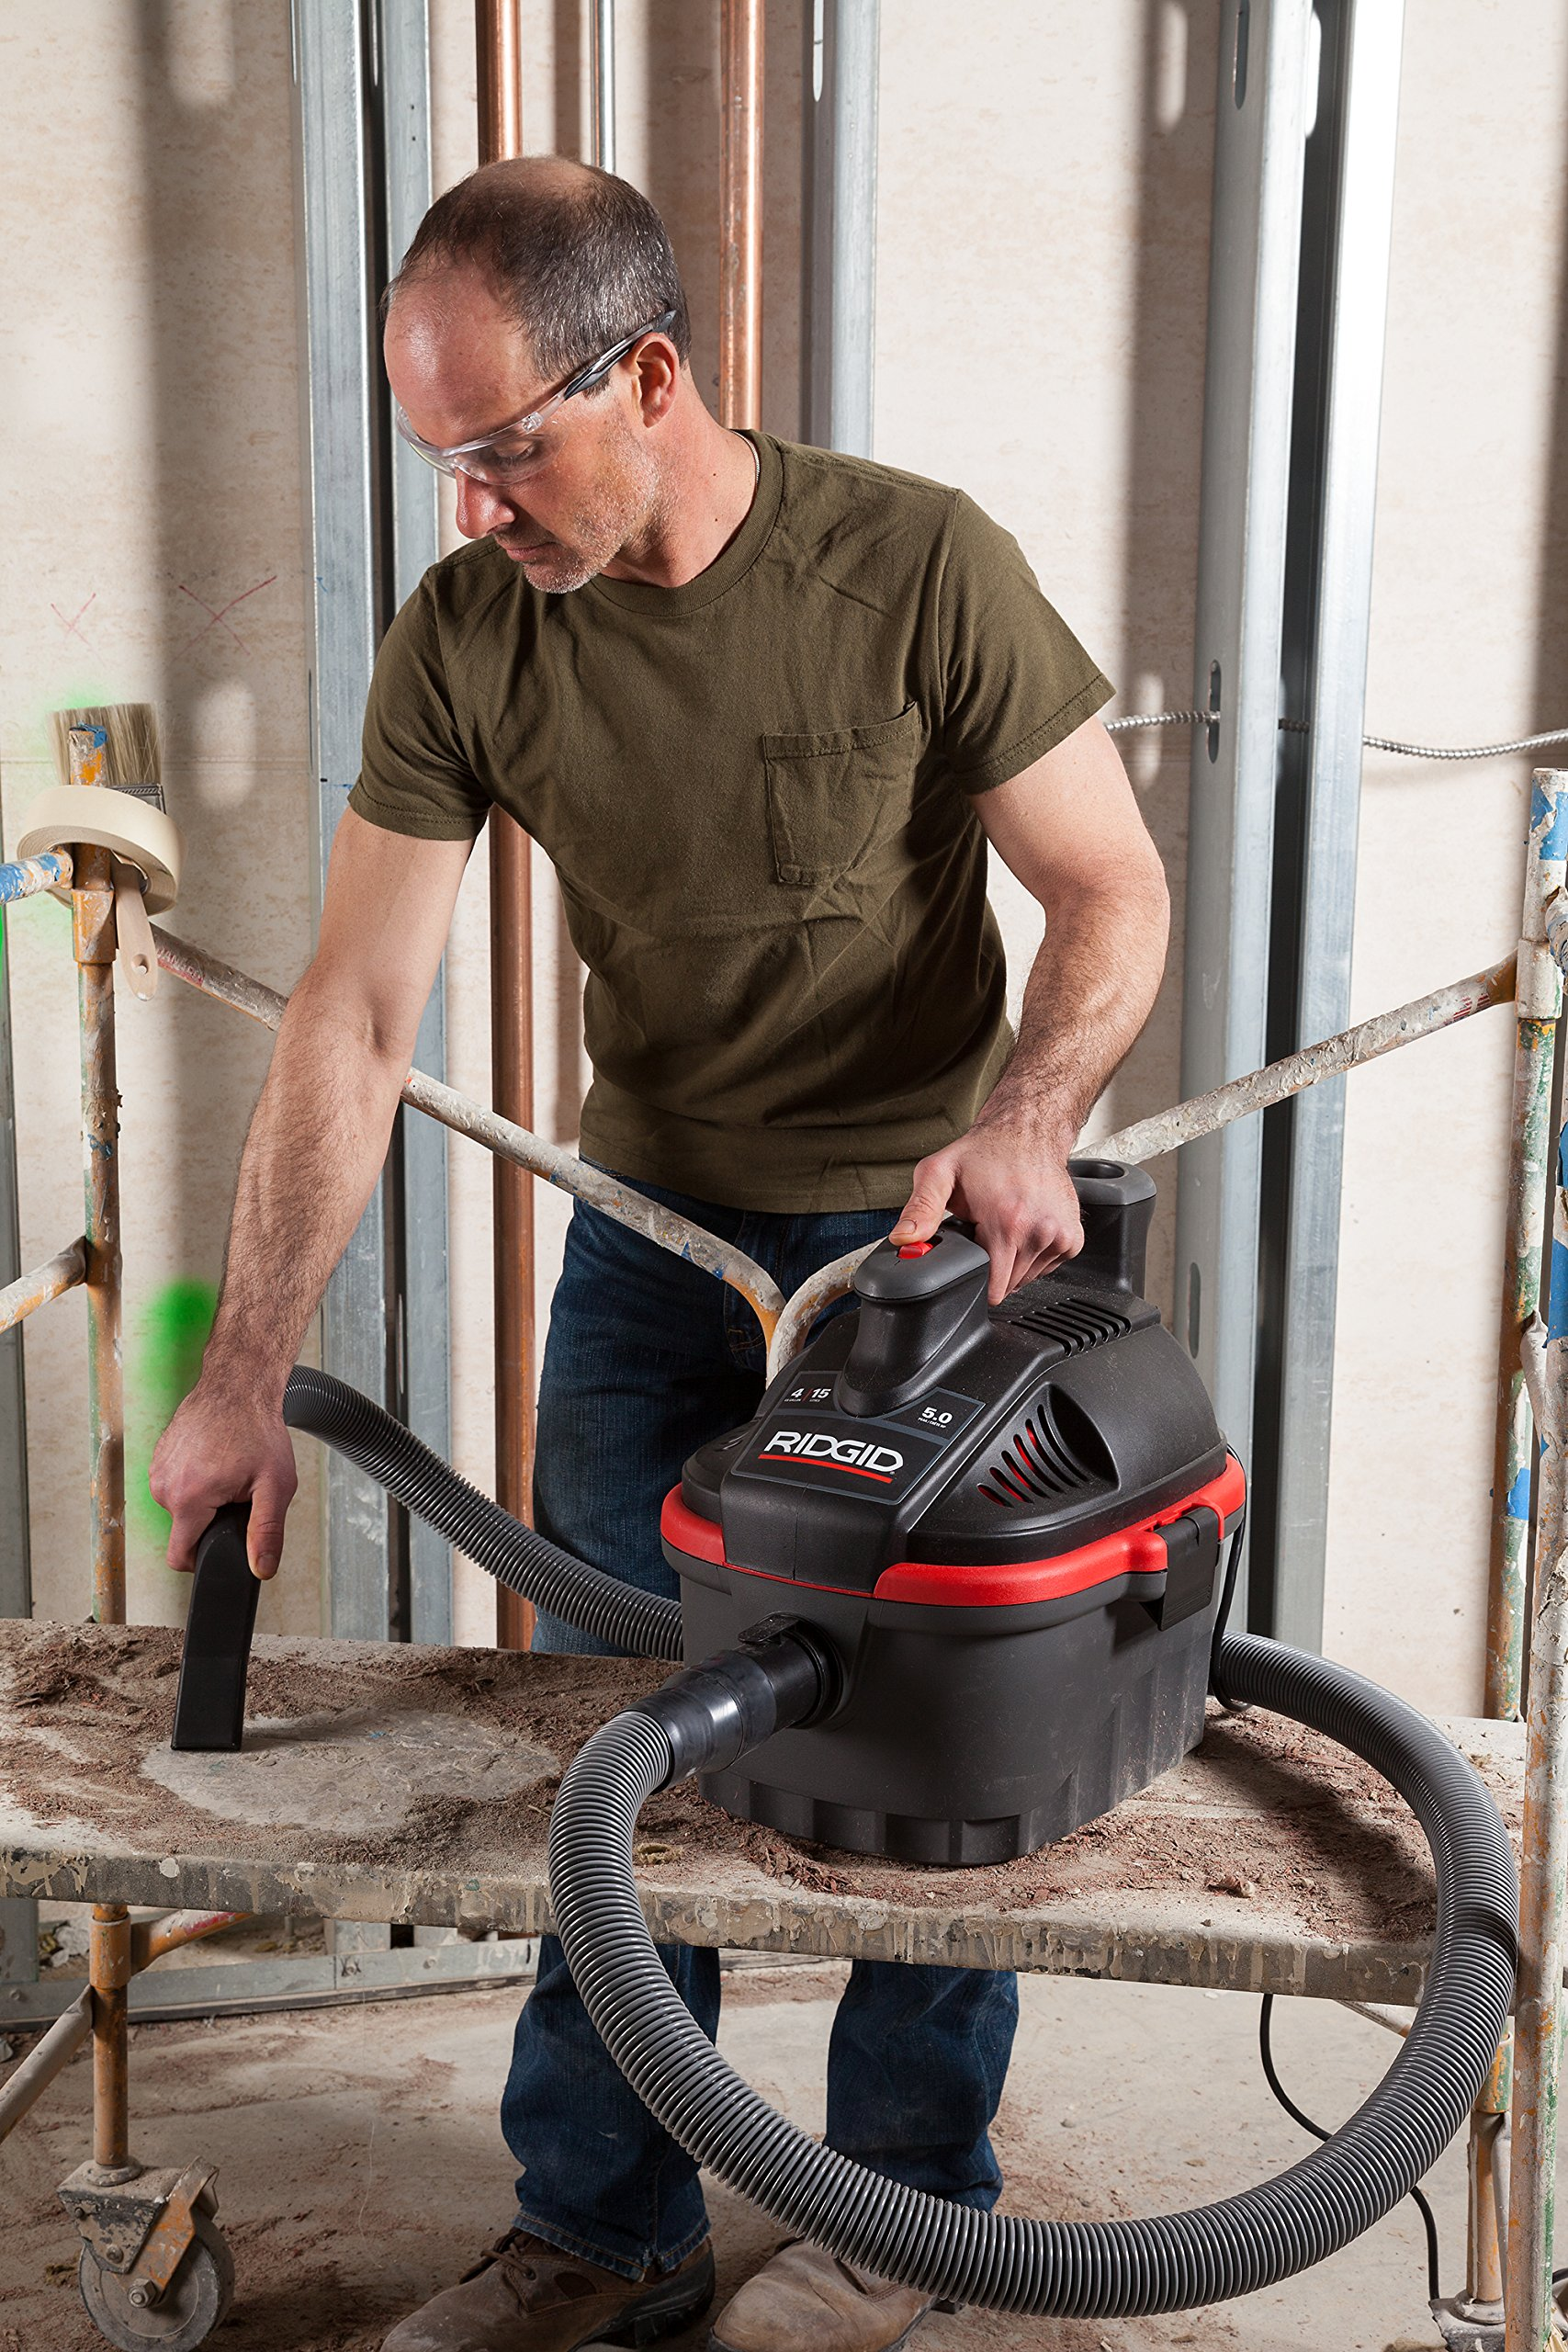 RIDGID 50313 4000RV Portable Wet Dry Vacuum, 4-Gallon Small Wet Dry Vac with 5.0 Peak HP Motor, Pro Hose, Ergonomic Handle, Cord Wrap, Blower Port by Ridgid (Image #6)